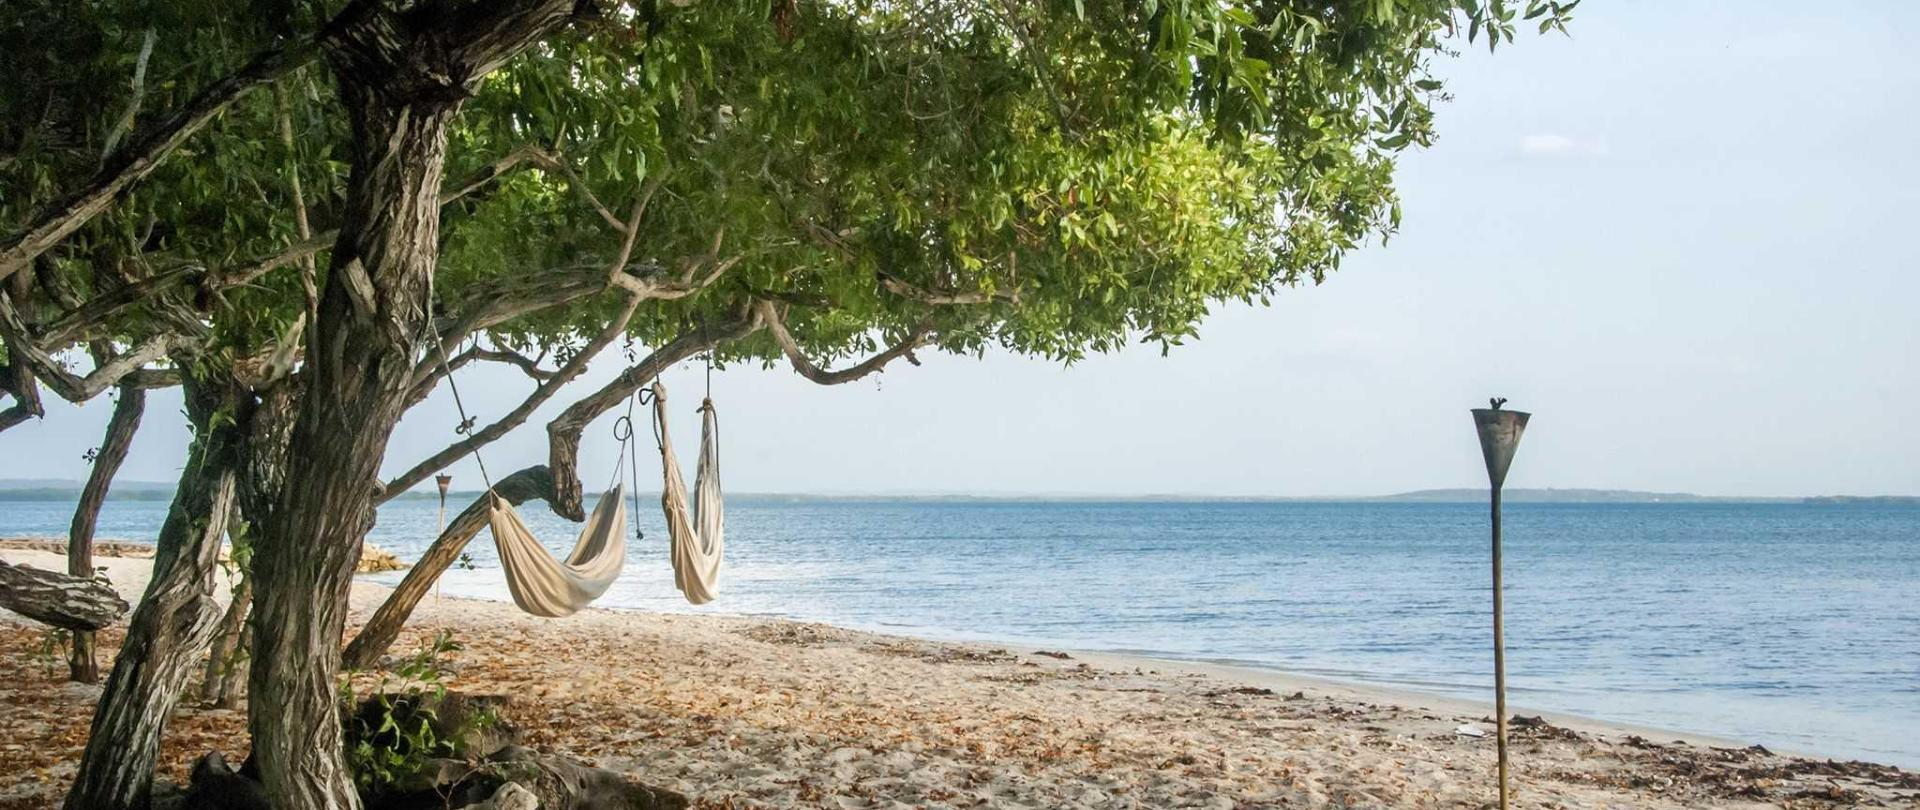 hotel-playa-manglares-isla-baru-beach-04.jpg